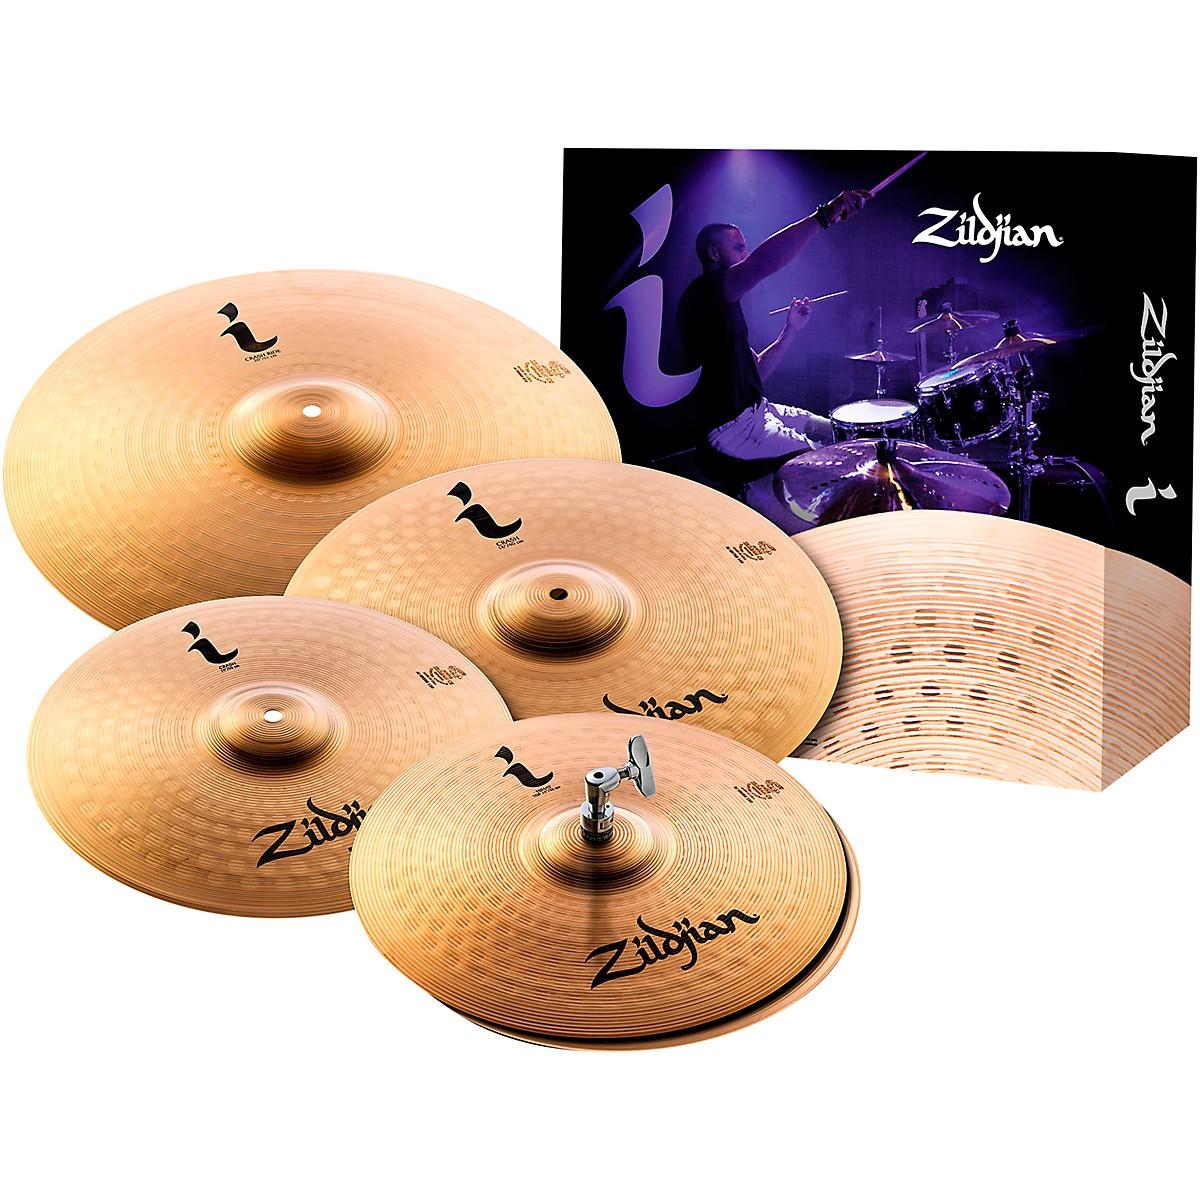 Zildjian I Series Pro Cymbal 5 Pack